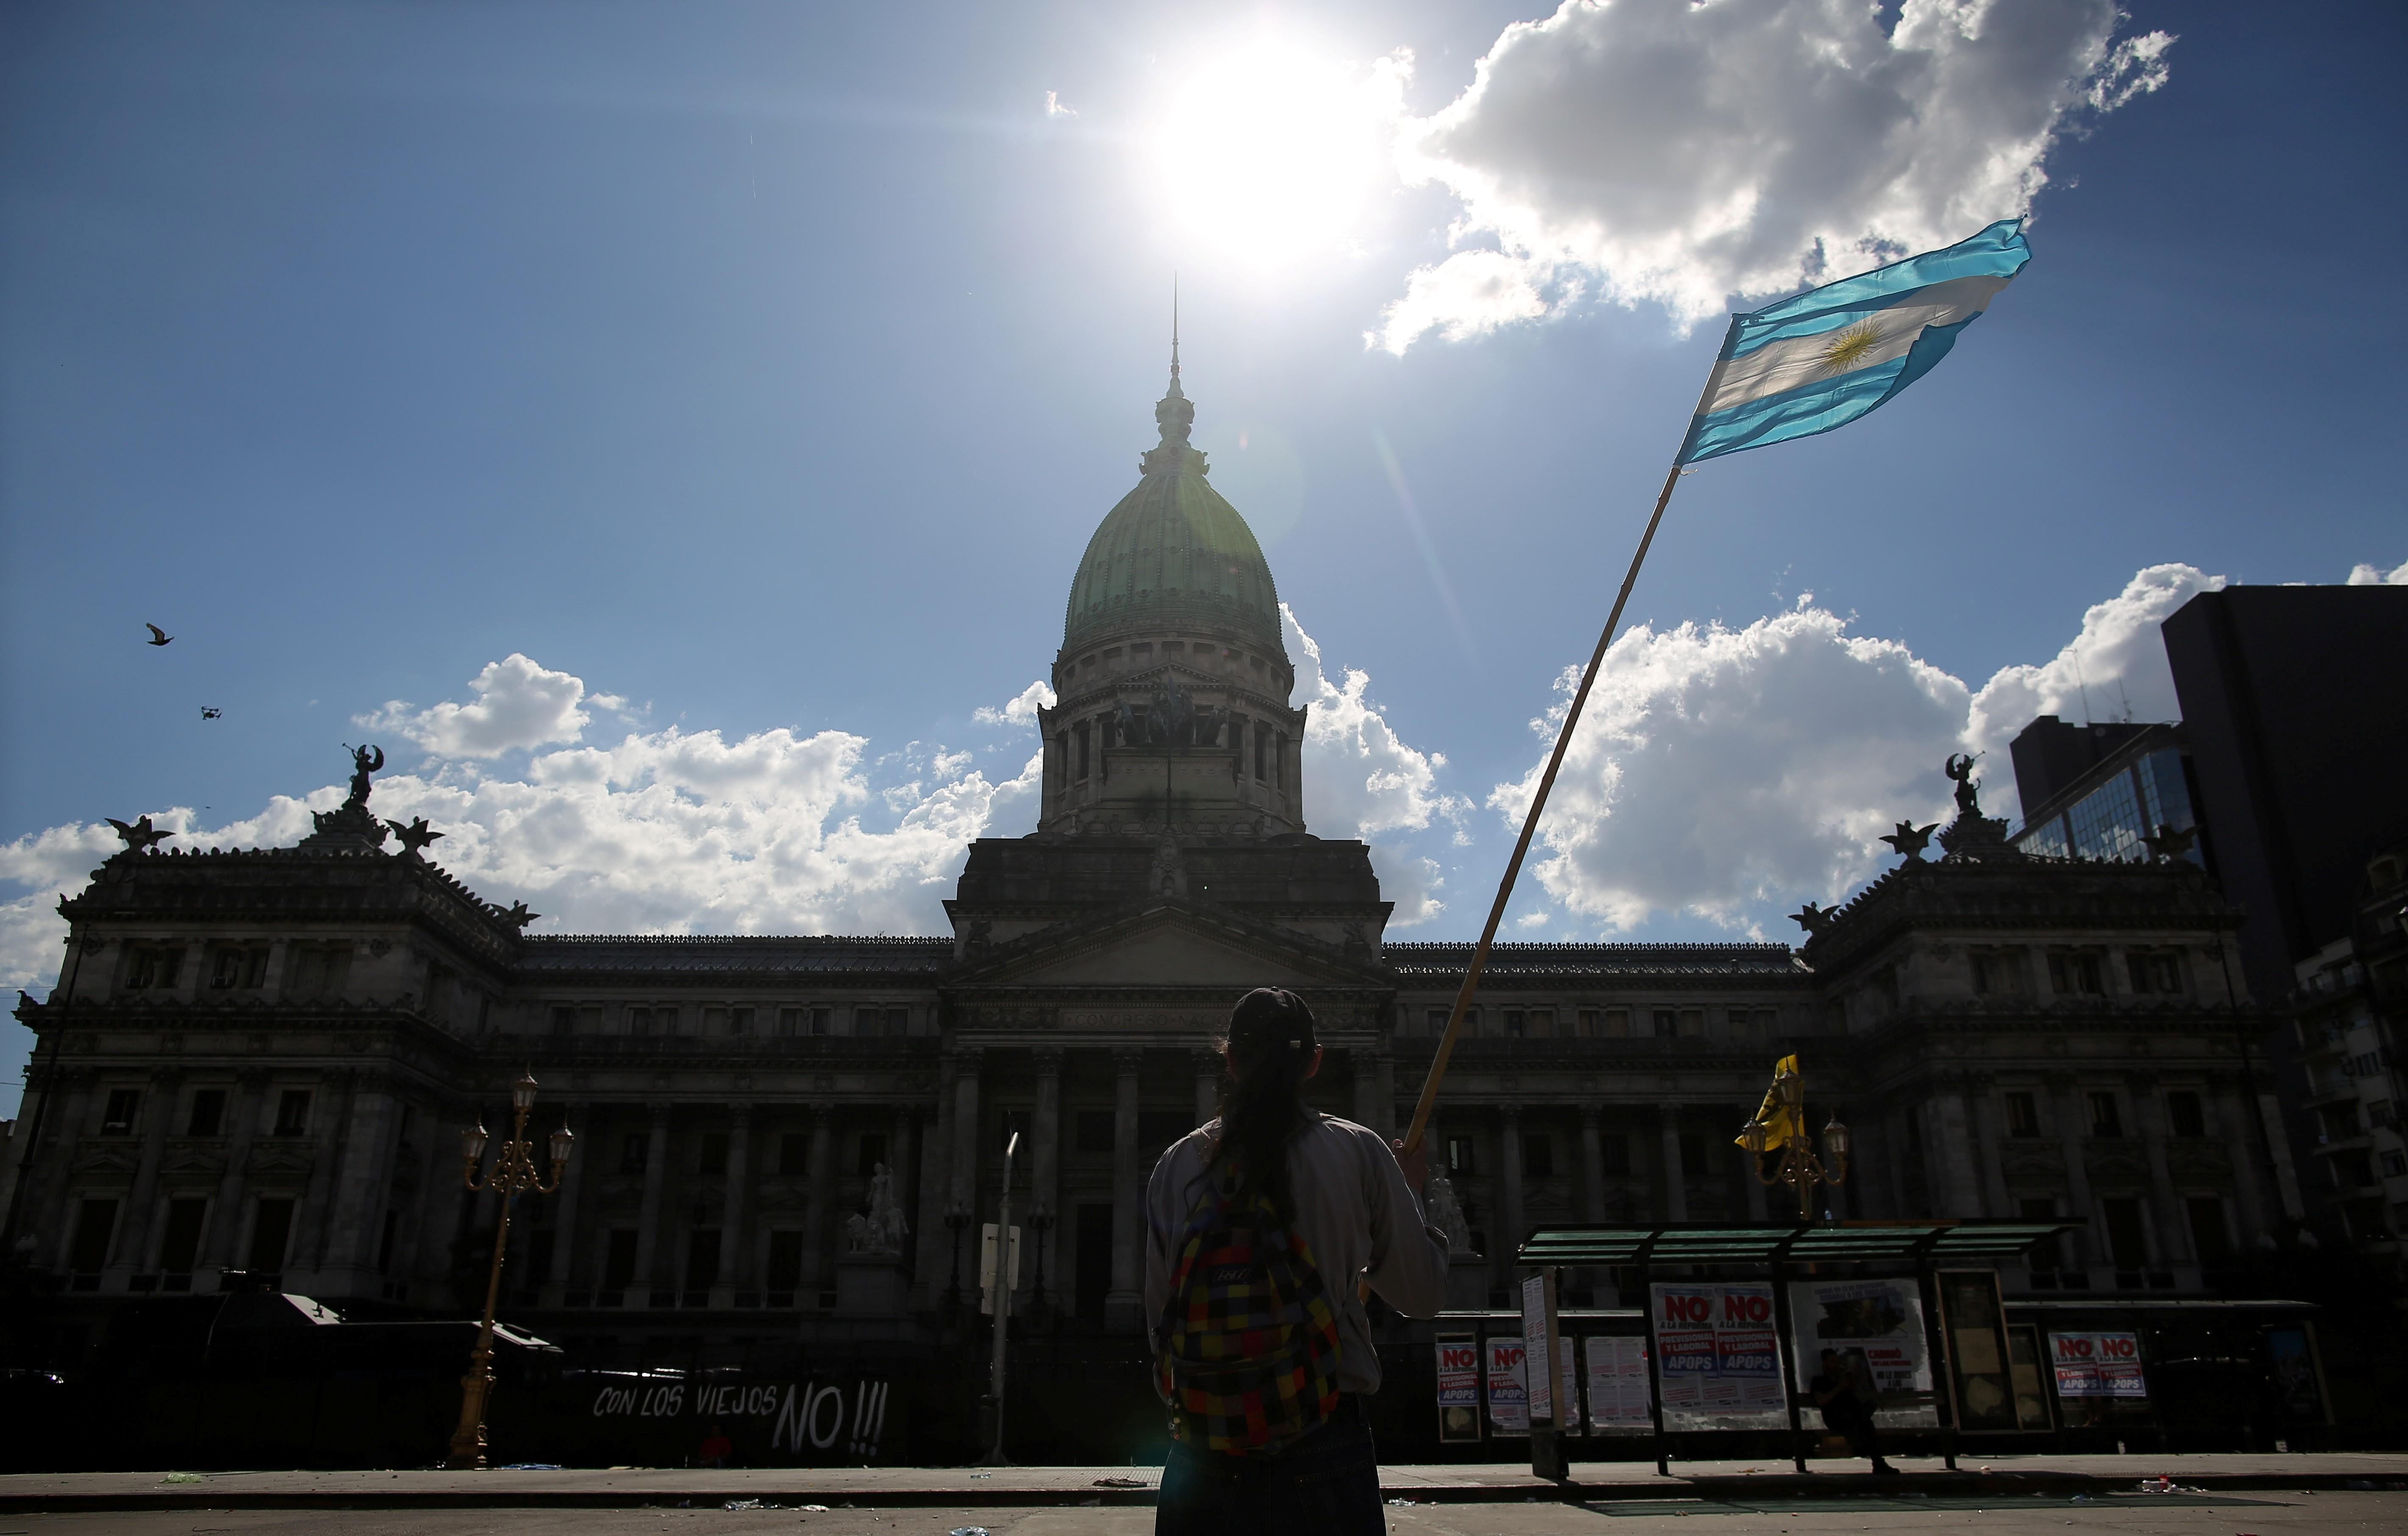 Argentina: nova lei reserva 1% dos cargos públicos para travestis, transexuais e transgêneros